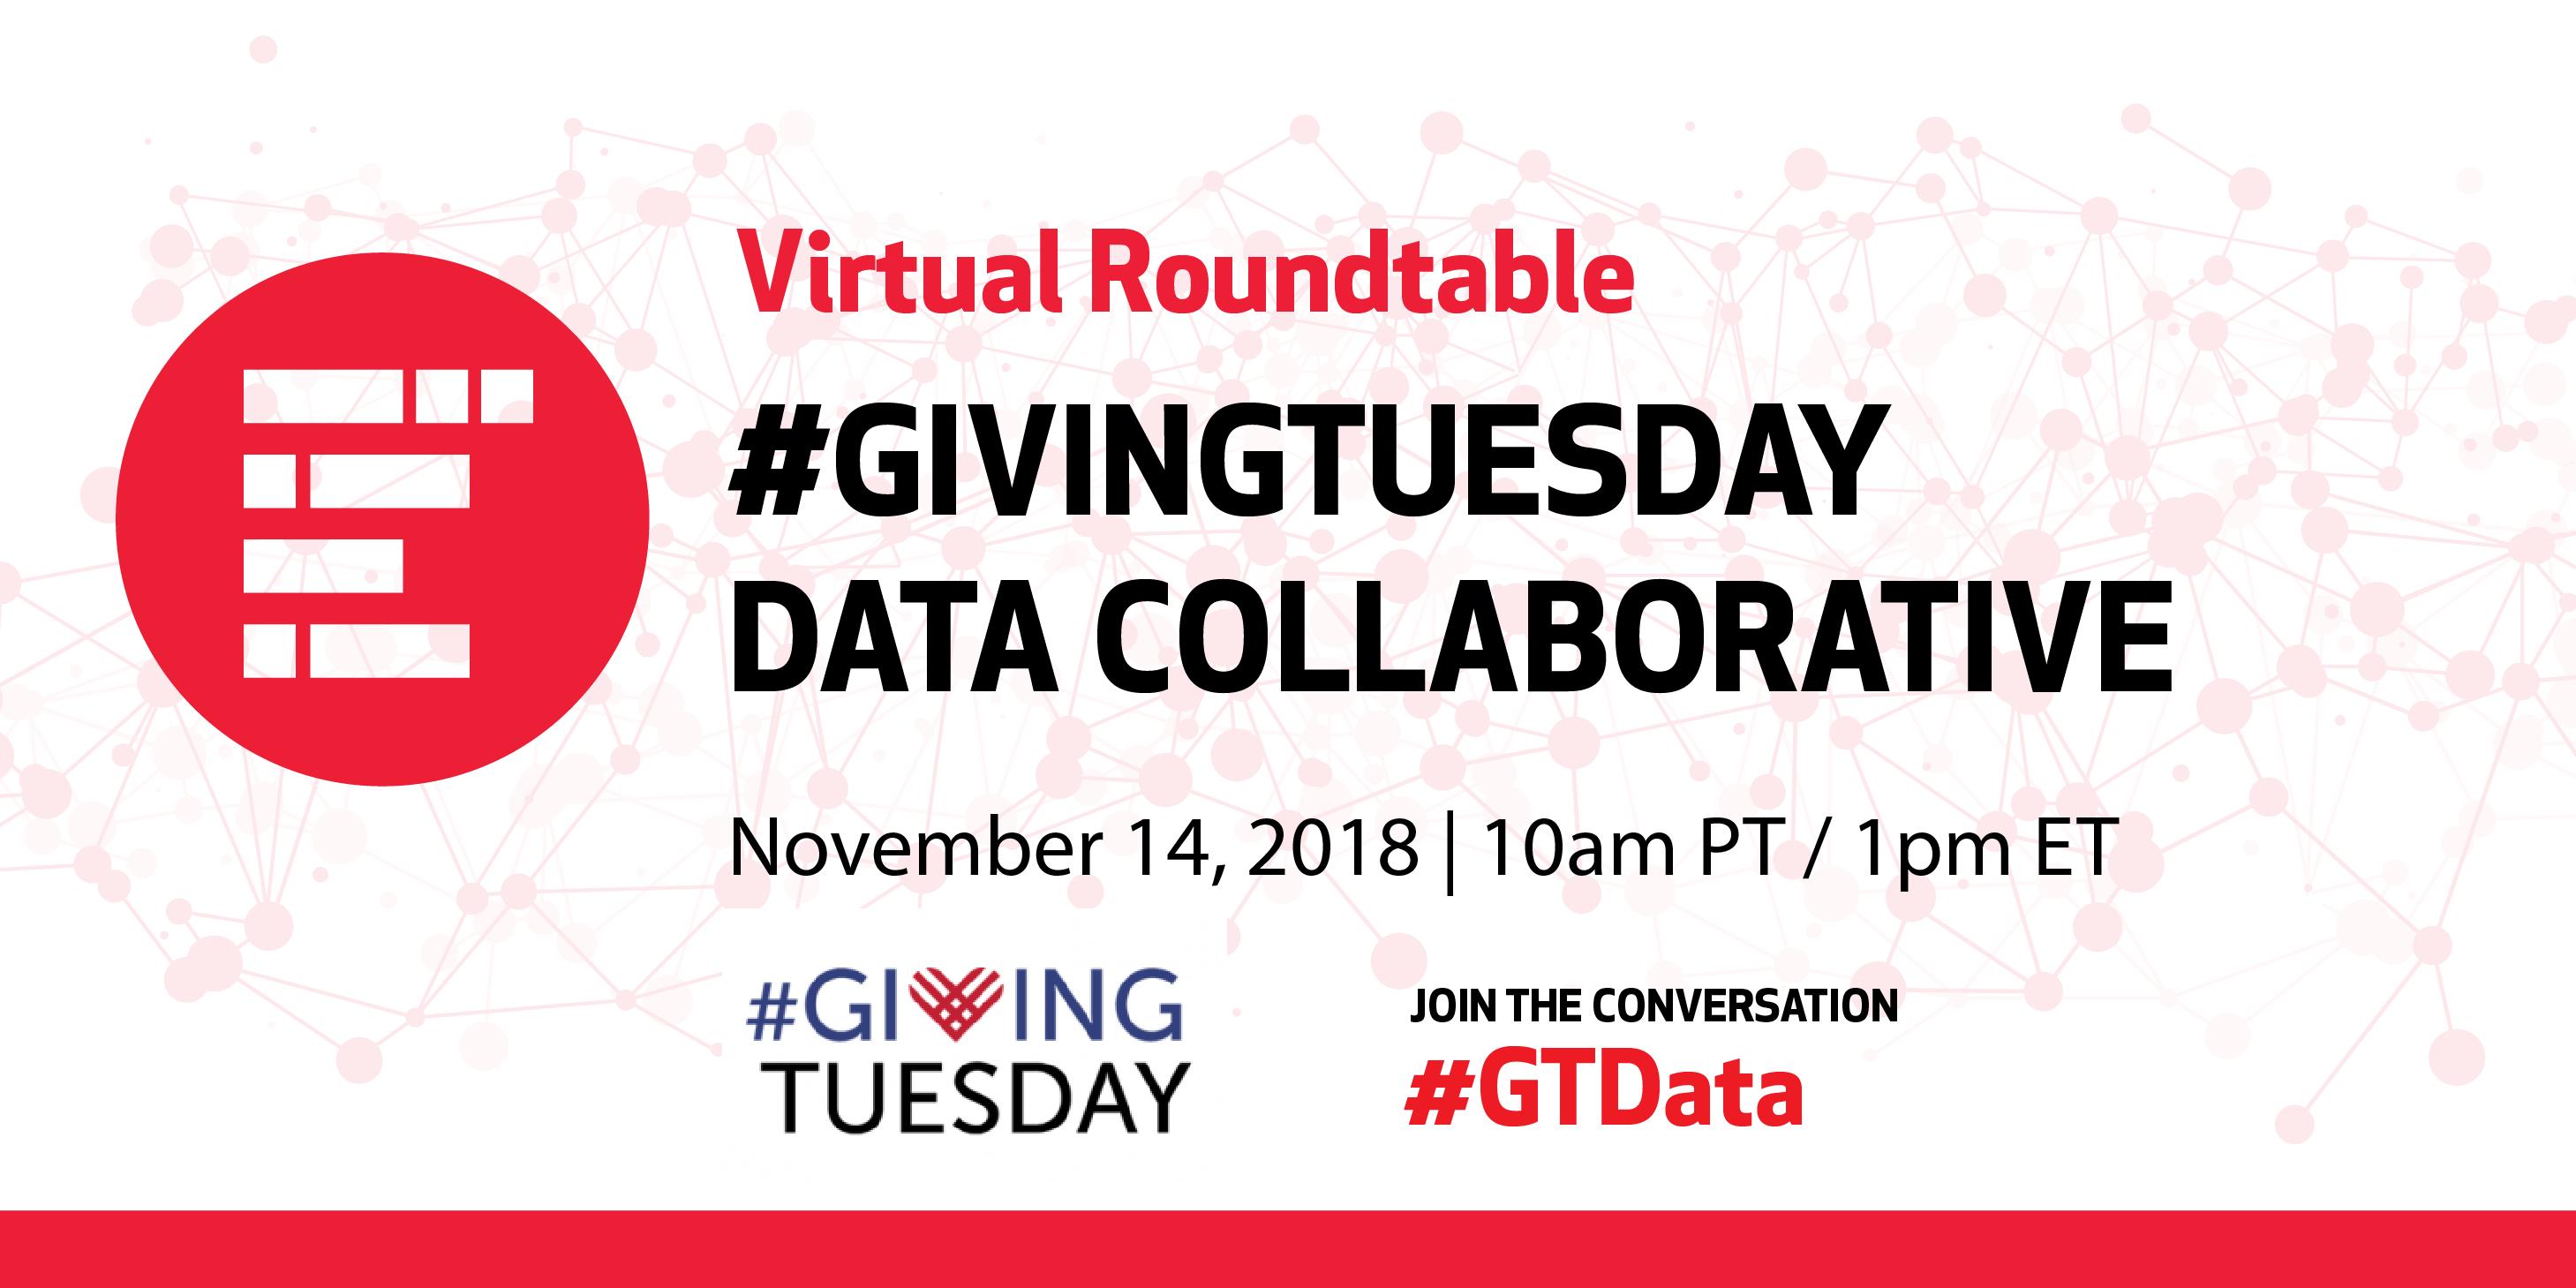 #GivingTuesday Data Collaborative